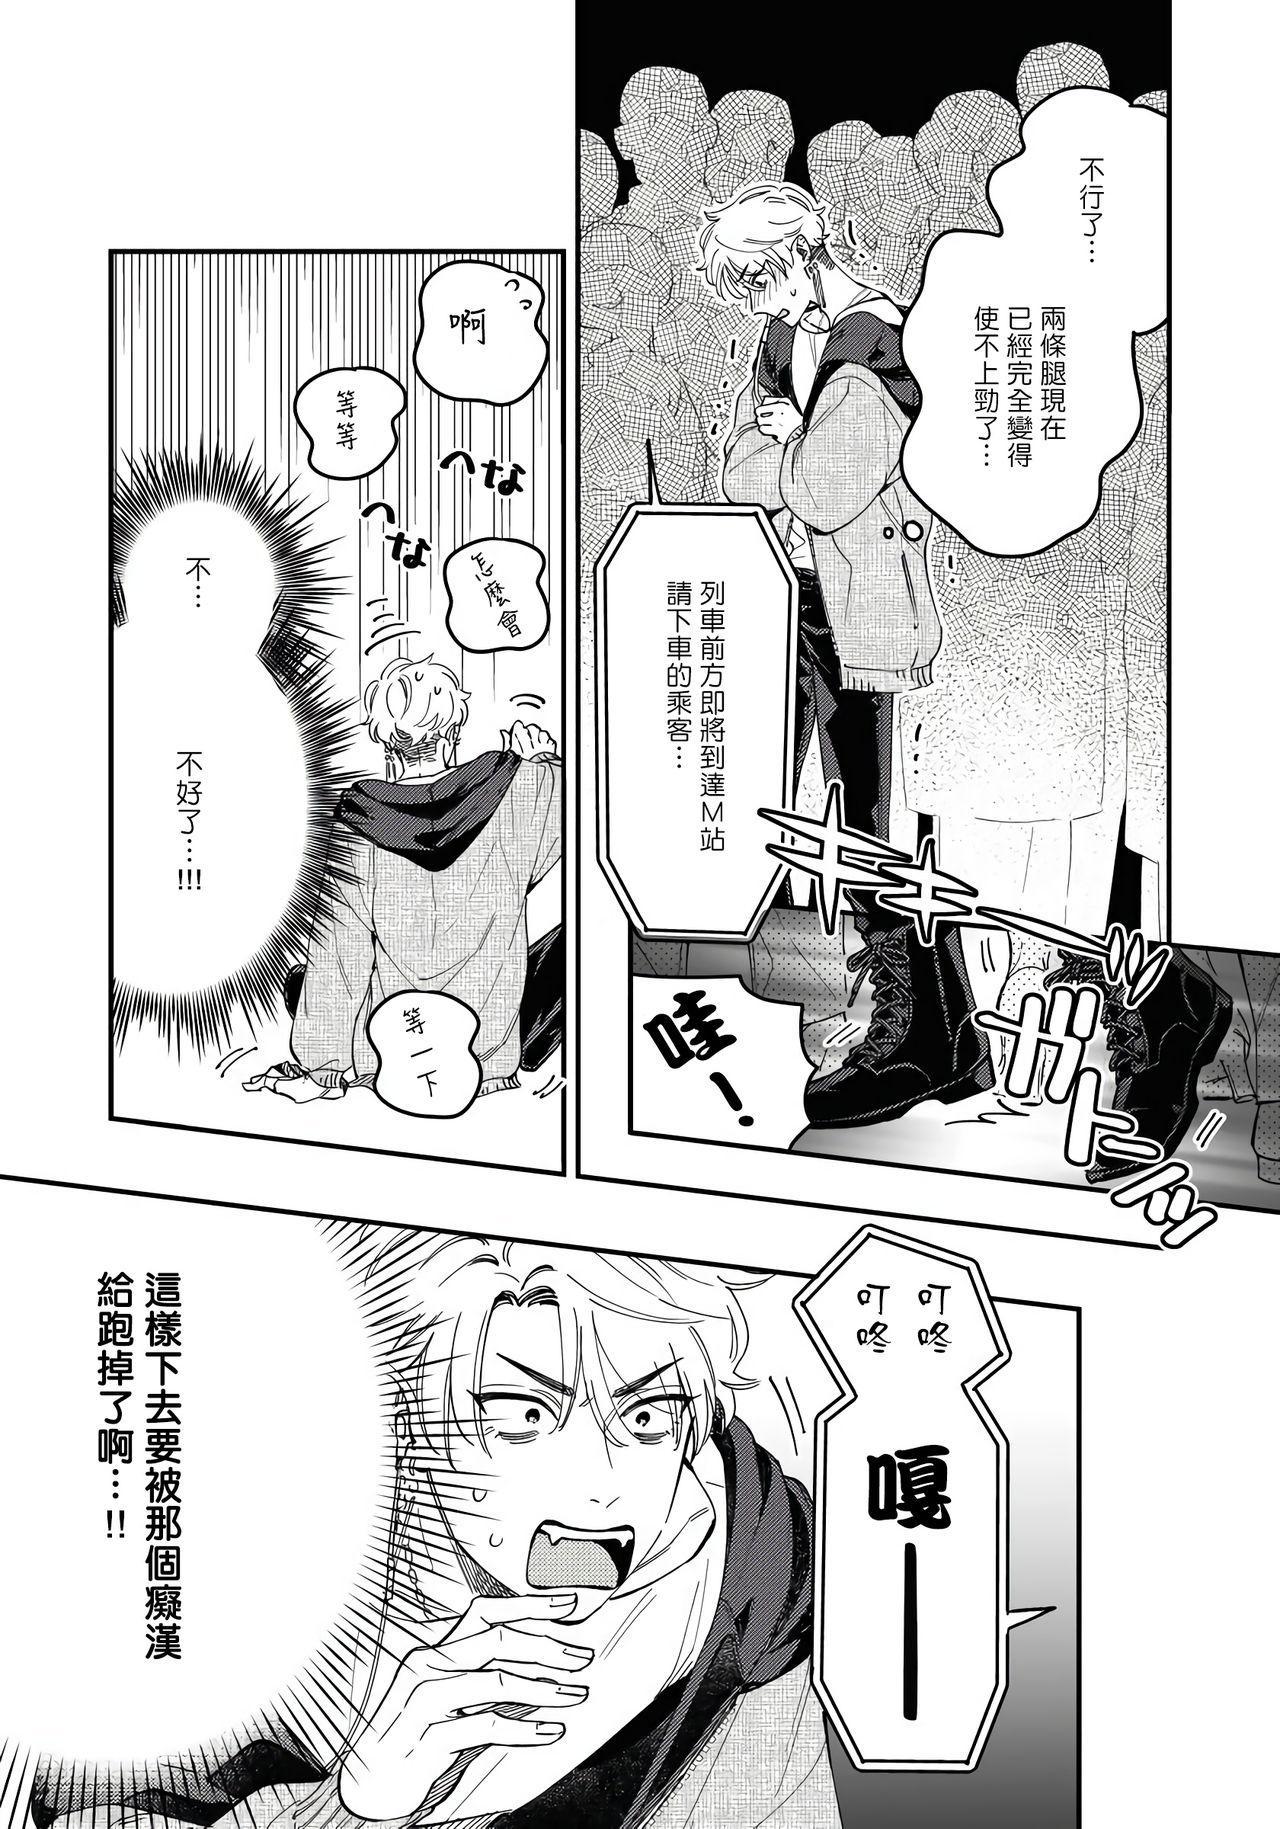 Kokomade Yarutoha Kiitenai! |之前可没听说要做到这个份上啊! 1-3 15